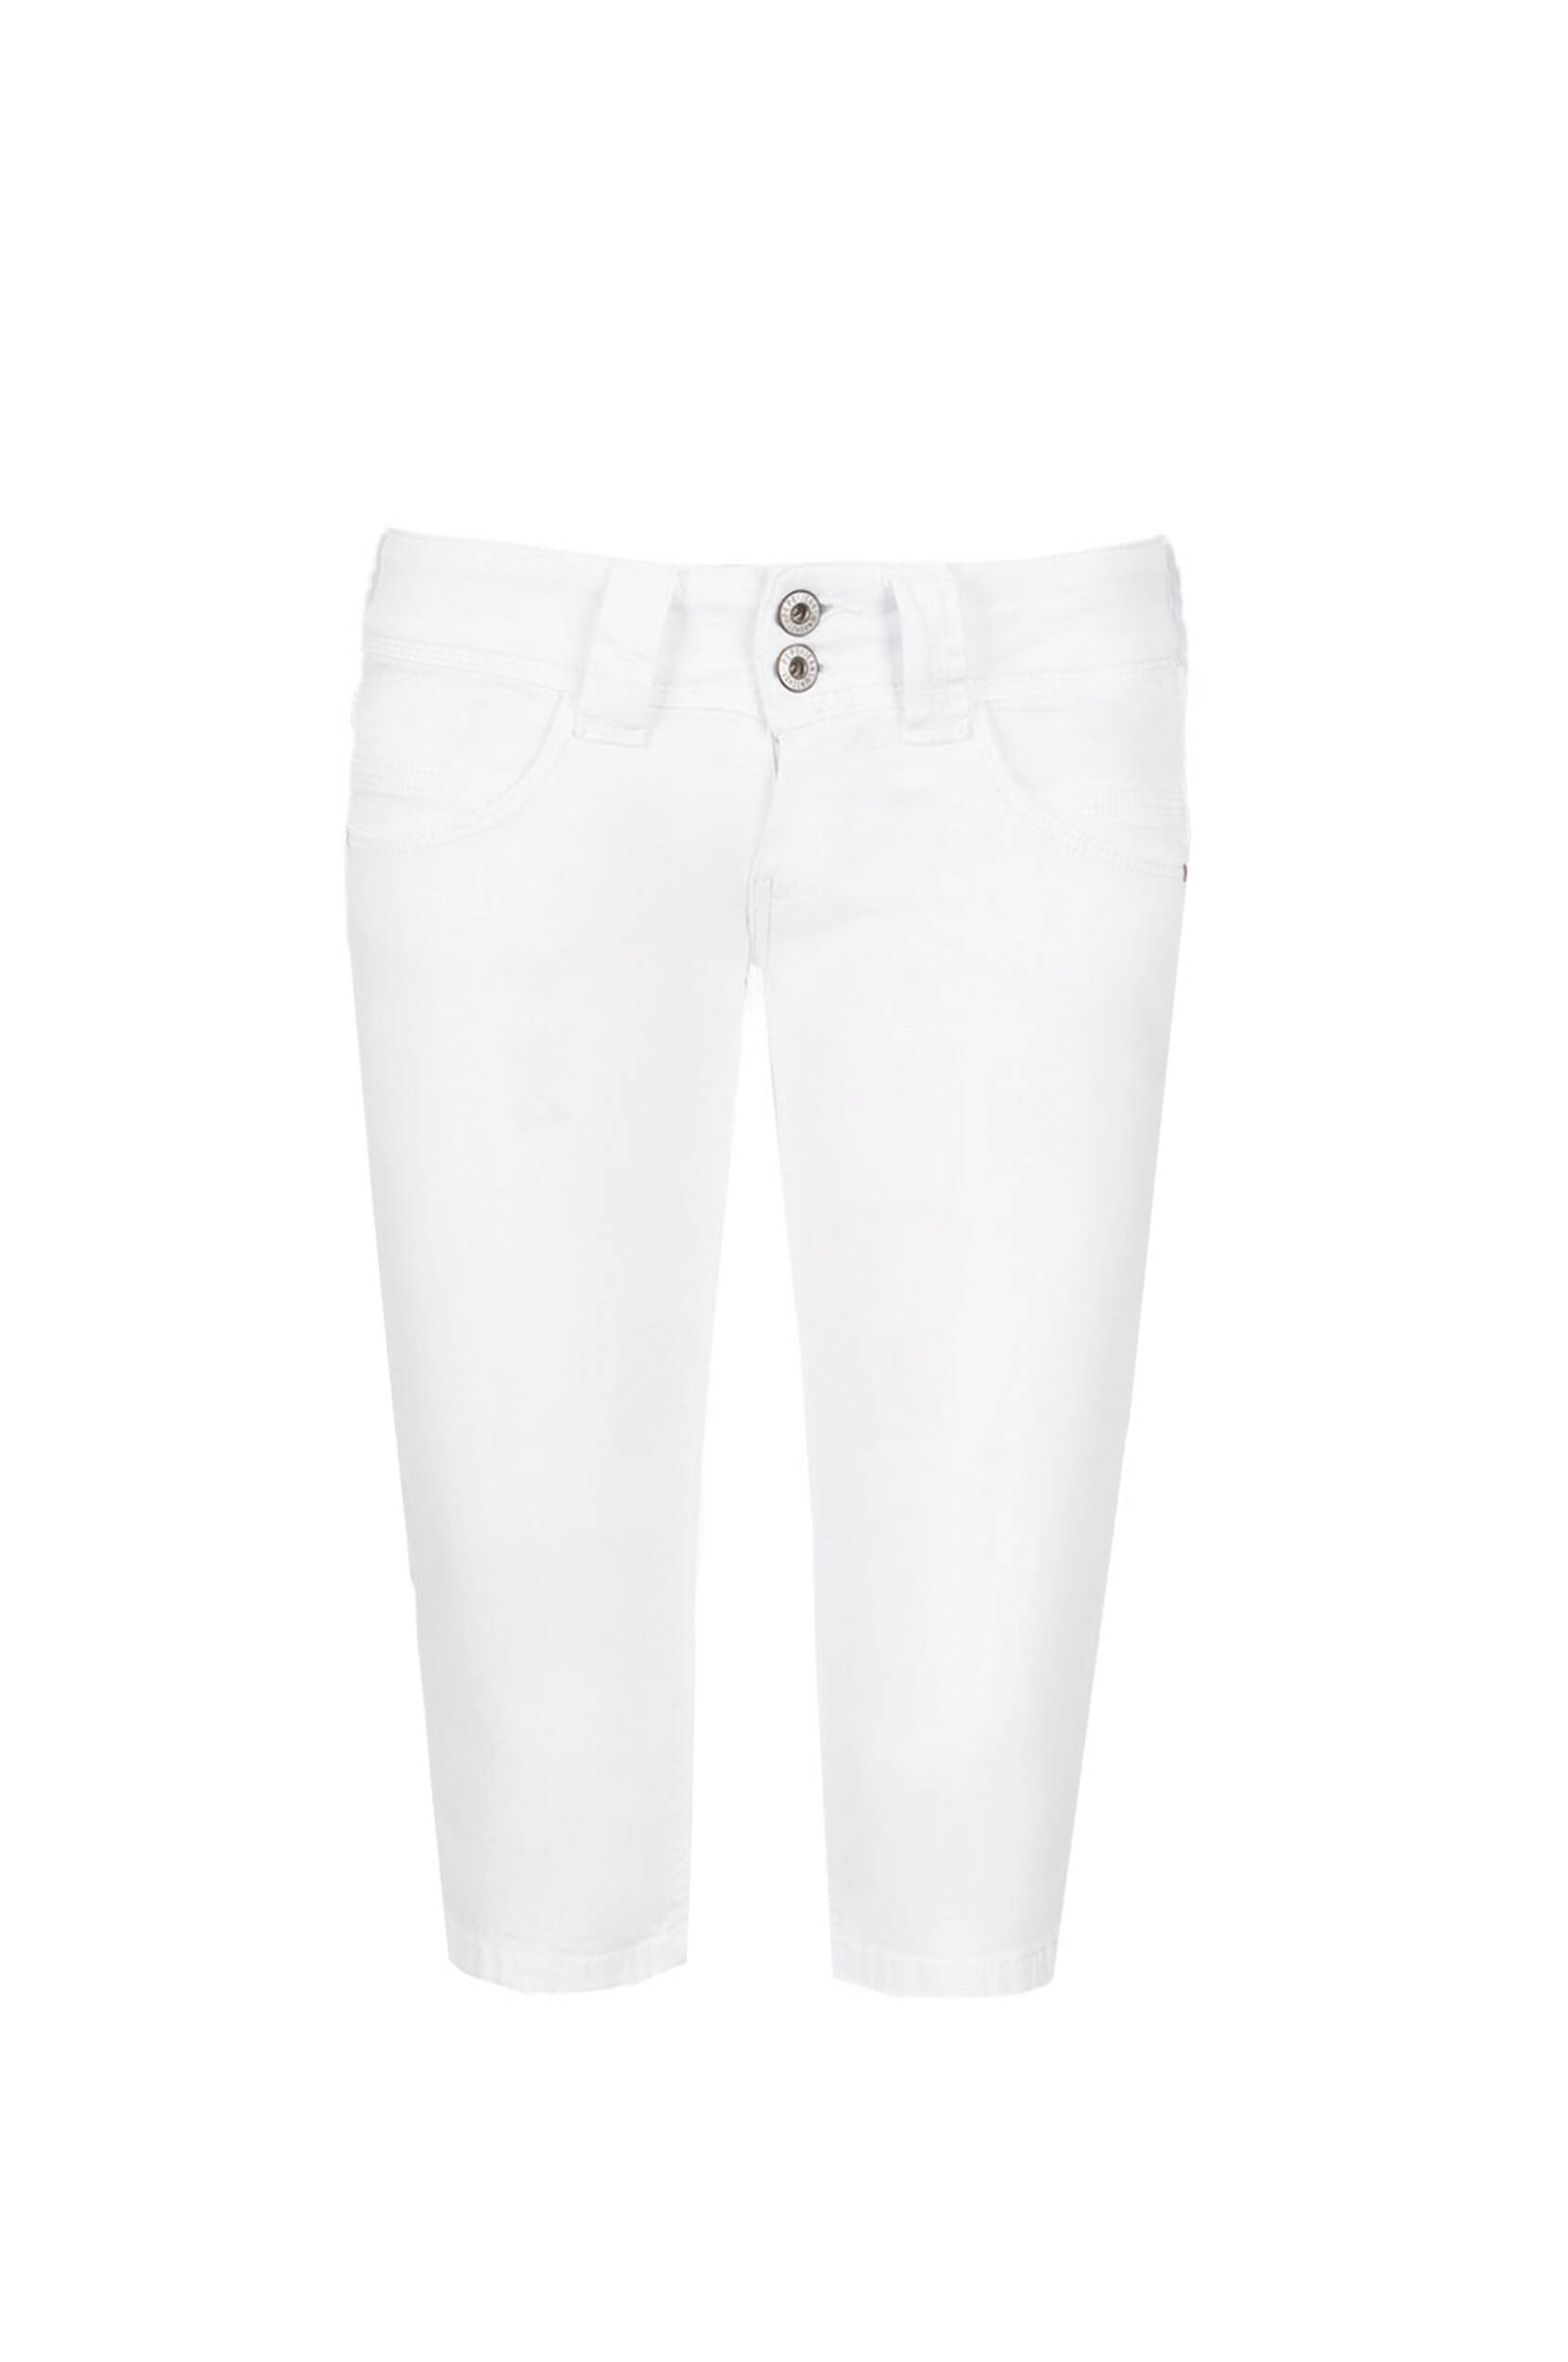 venus crop shorts pepe jeans london white shorts. Black Bedroom Furniture Sets. Home Design Ideas